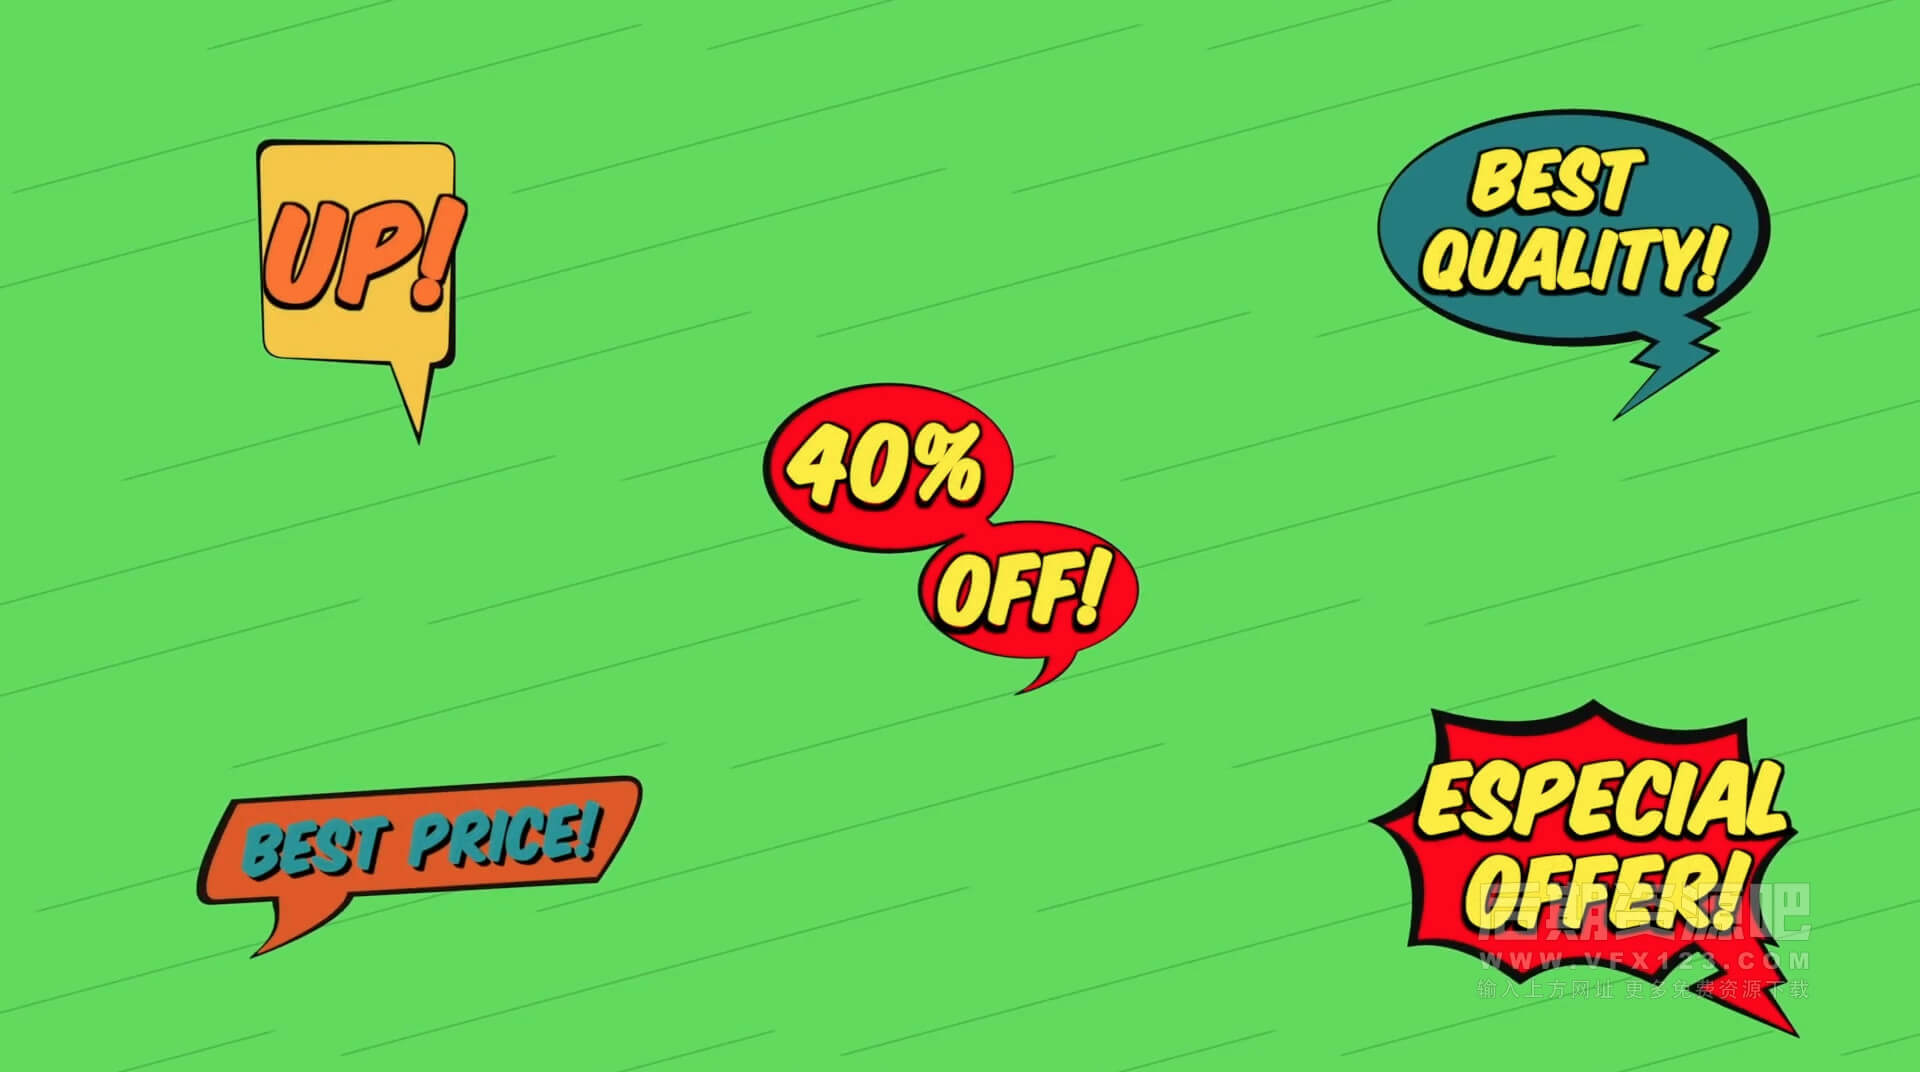 FCPX标题插件 20组卡通手绘漫画风格综艺气泡搞笑动画模板 Comic Titles | MAC影视后期资源站